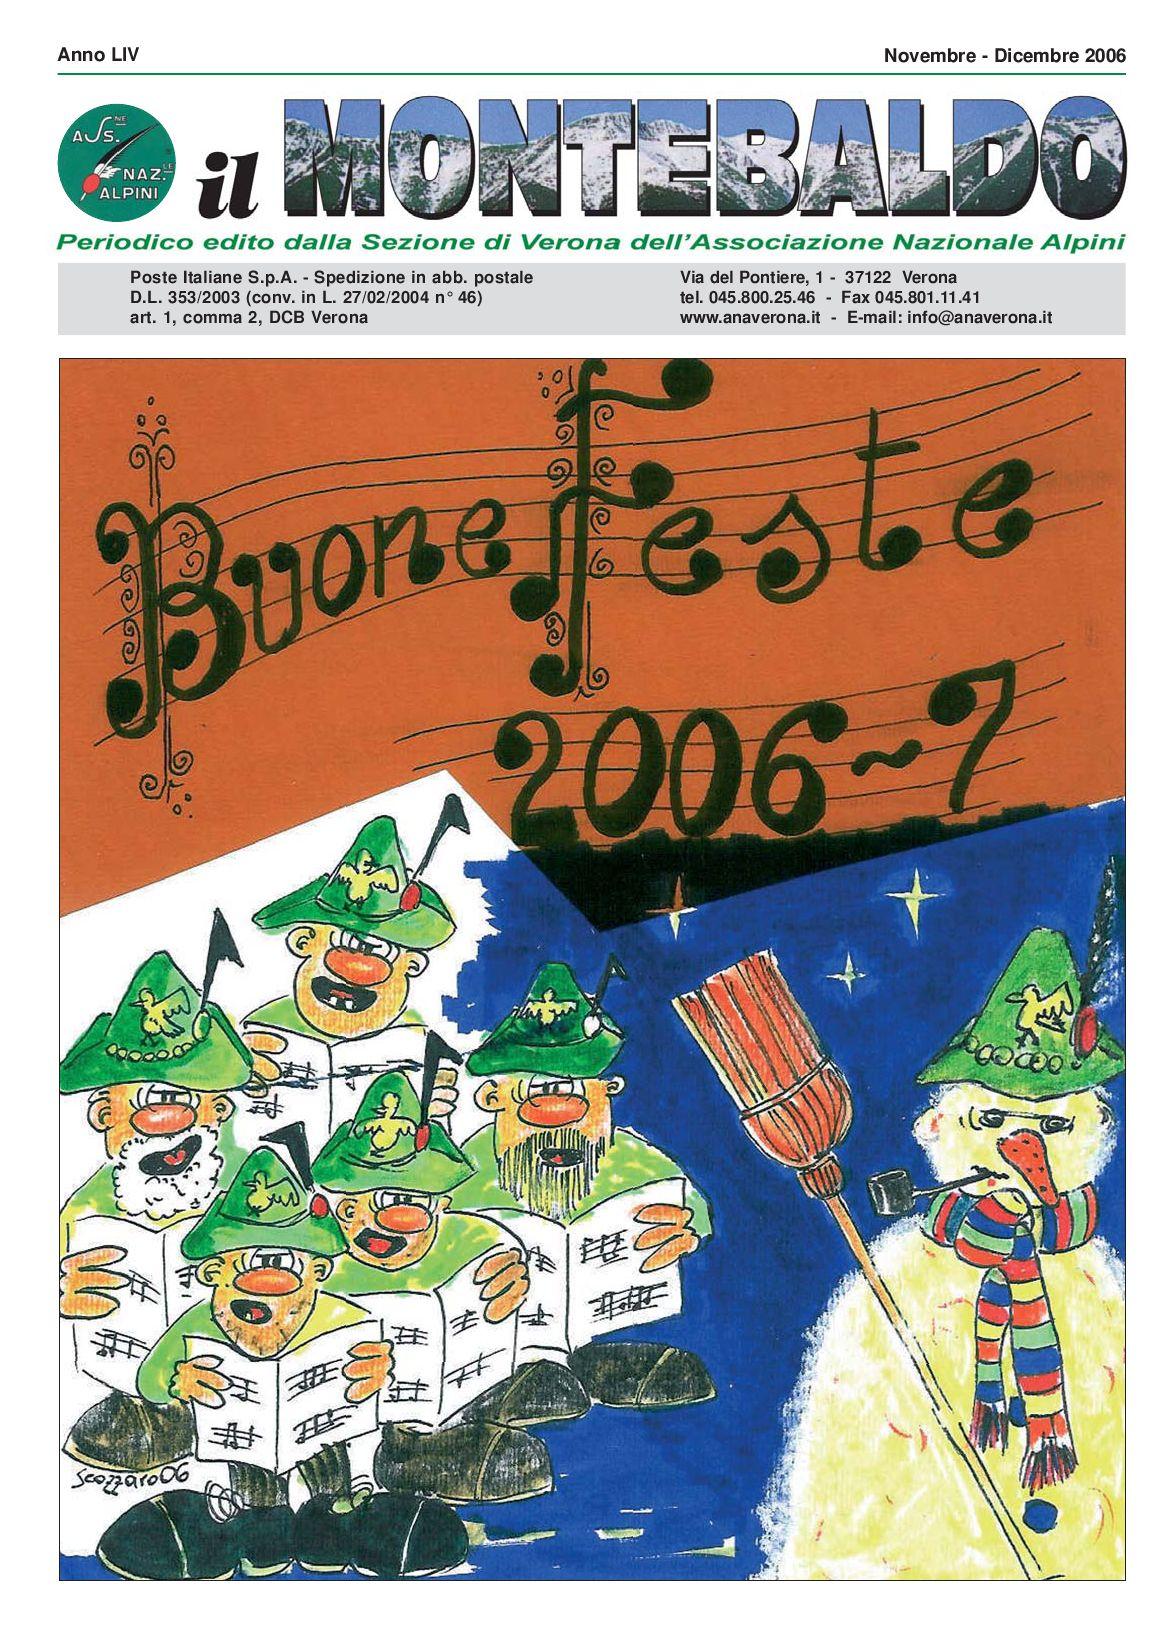 Calendario Prossime Adunate Alpini.Novembre Dicembre 2006 By A N A Verona Issuu